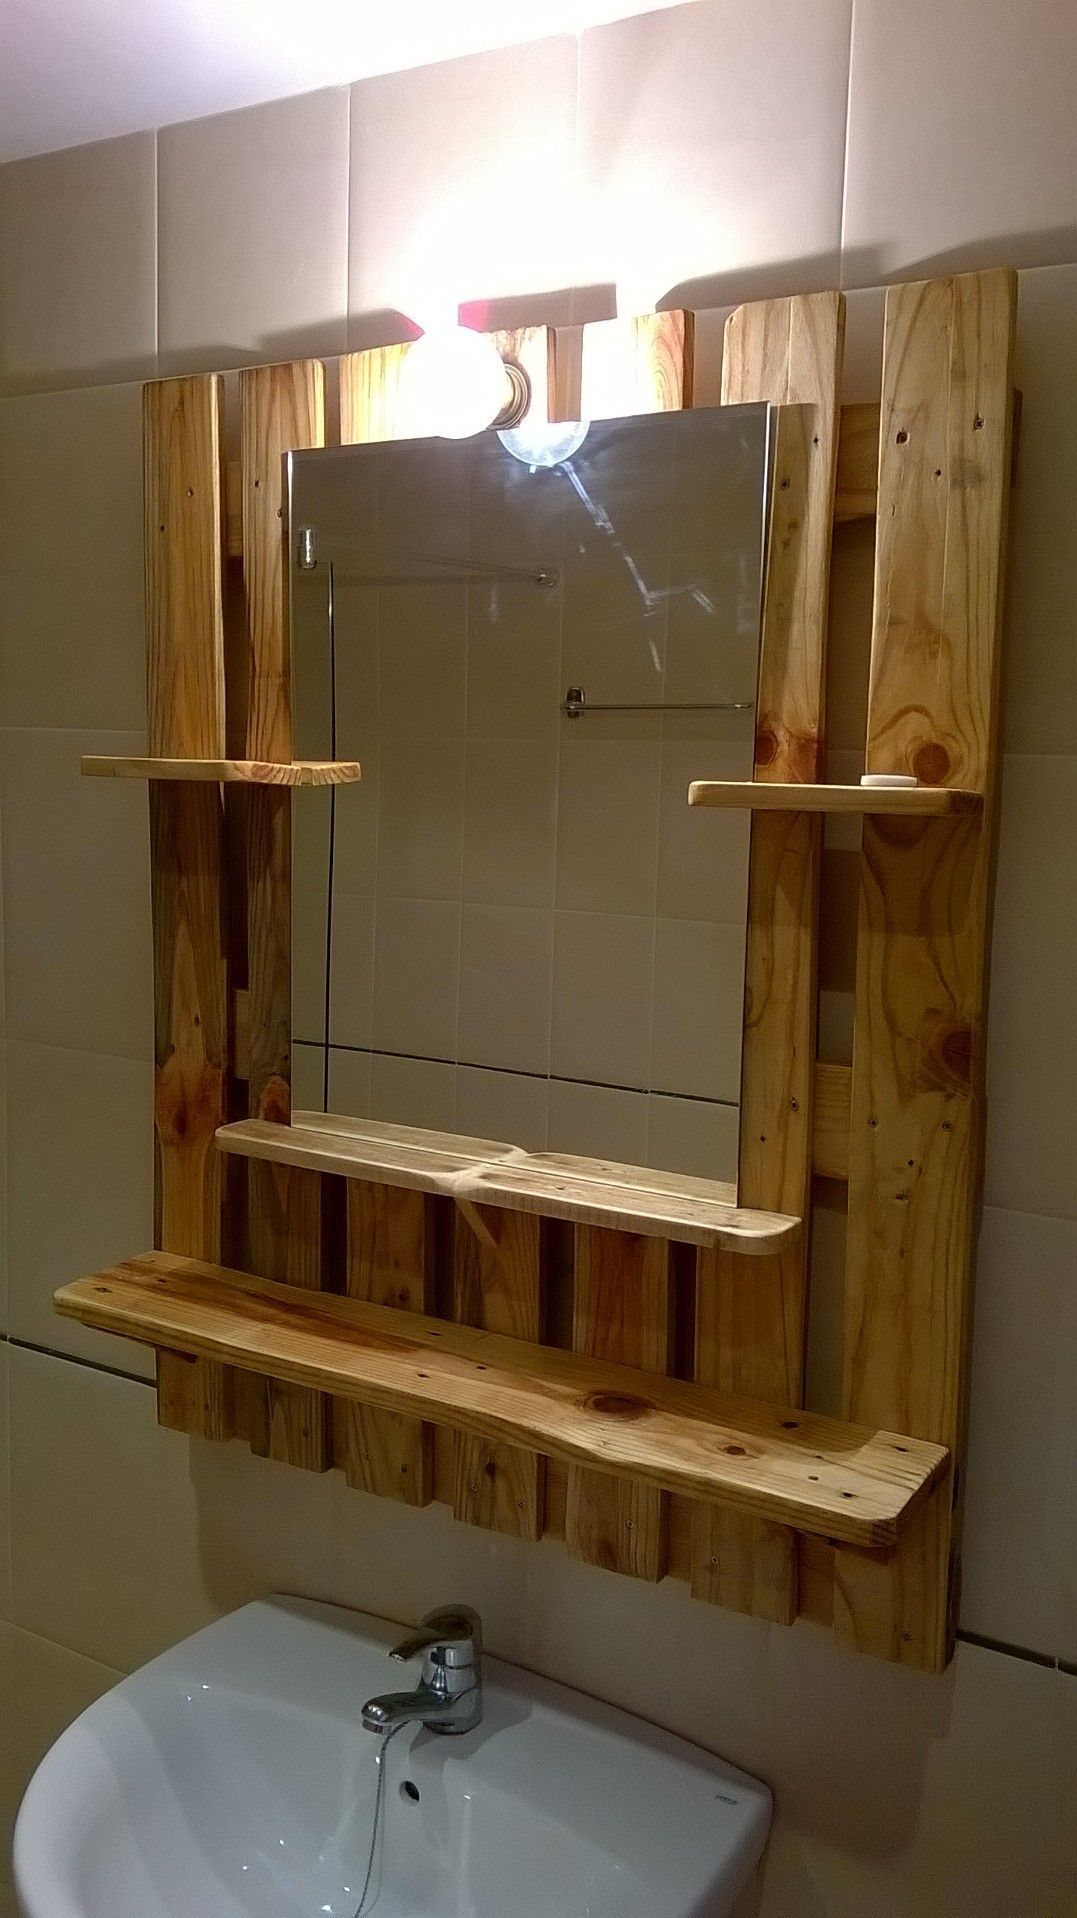 35+ Really Inspiring Bathroom Towel Racks Ideas